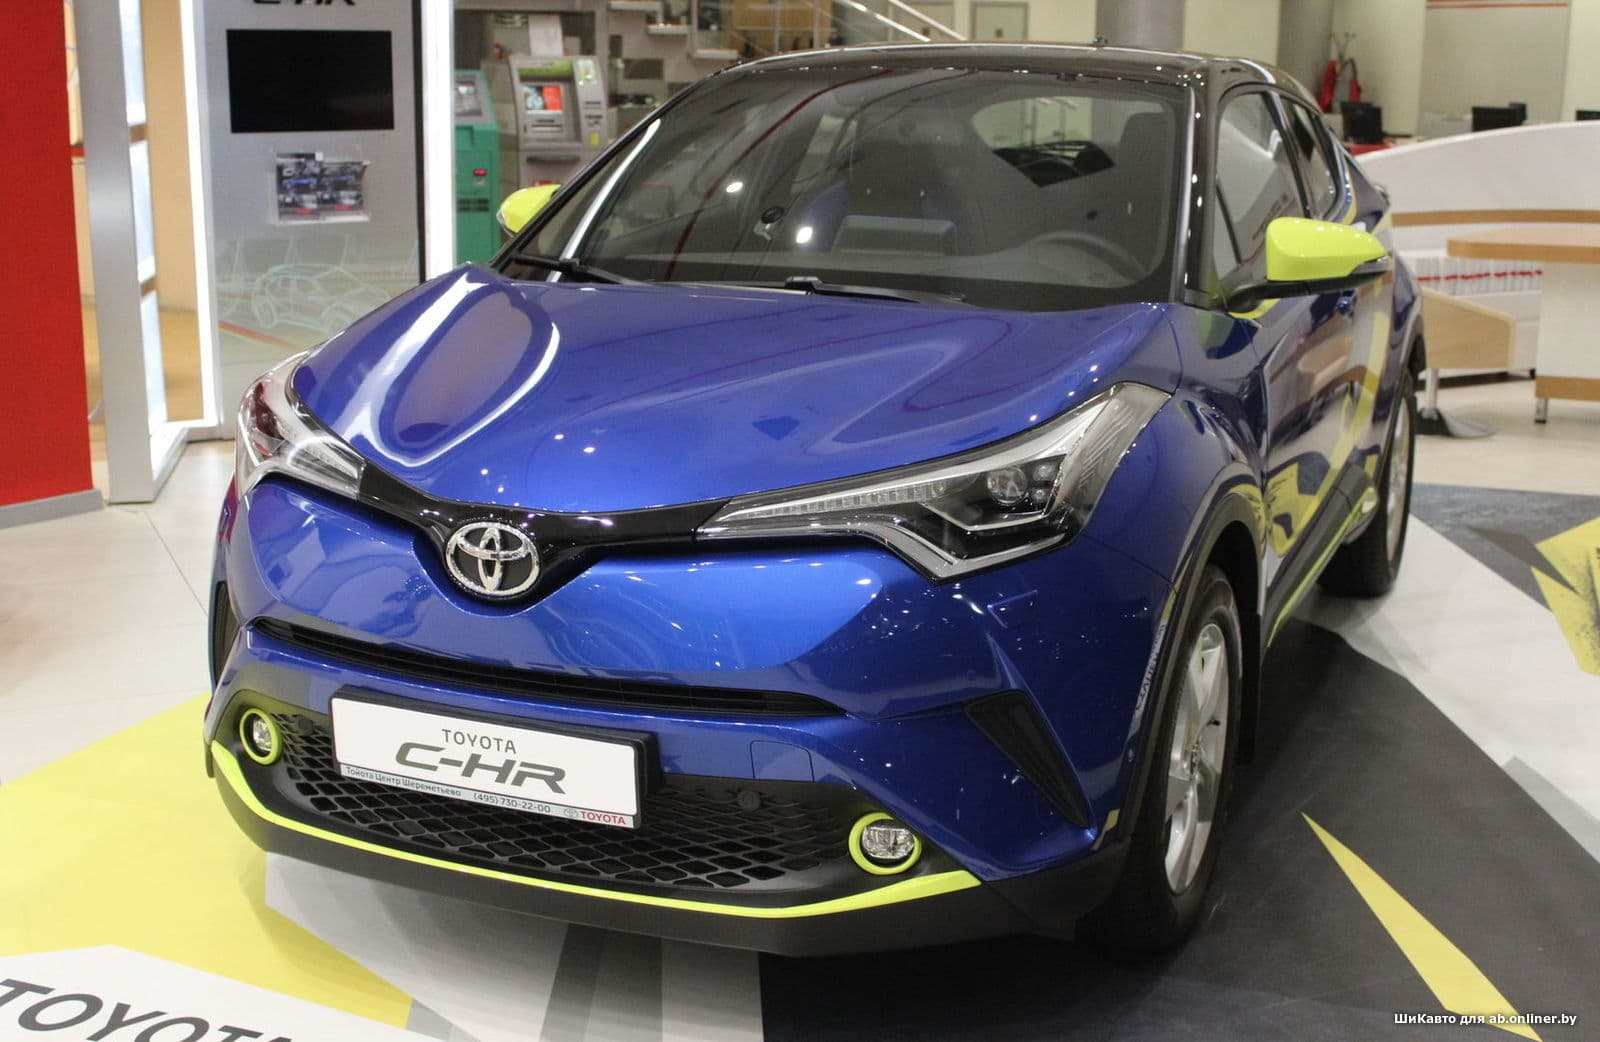 Toyota C-HR 1.2 CVT 4WD COOL